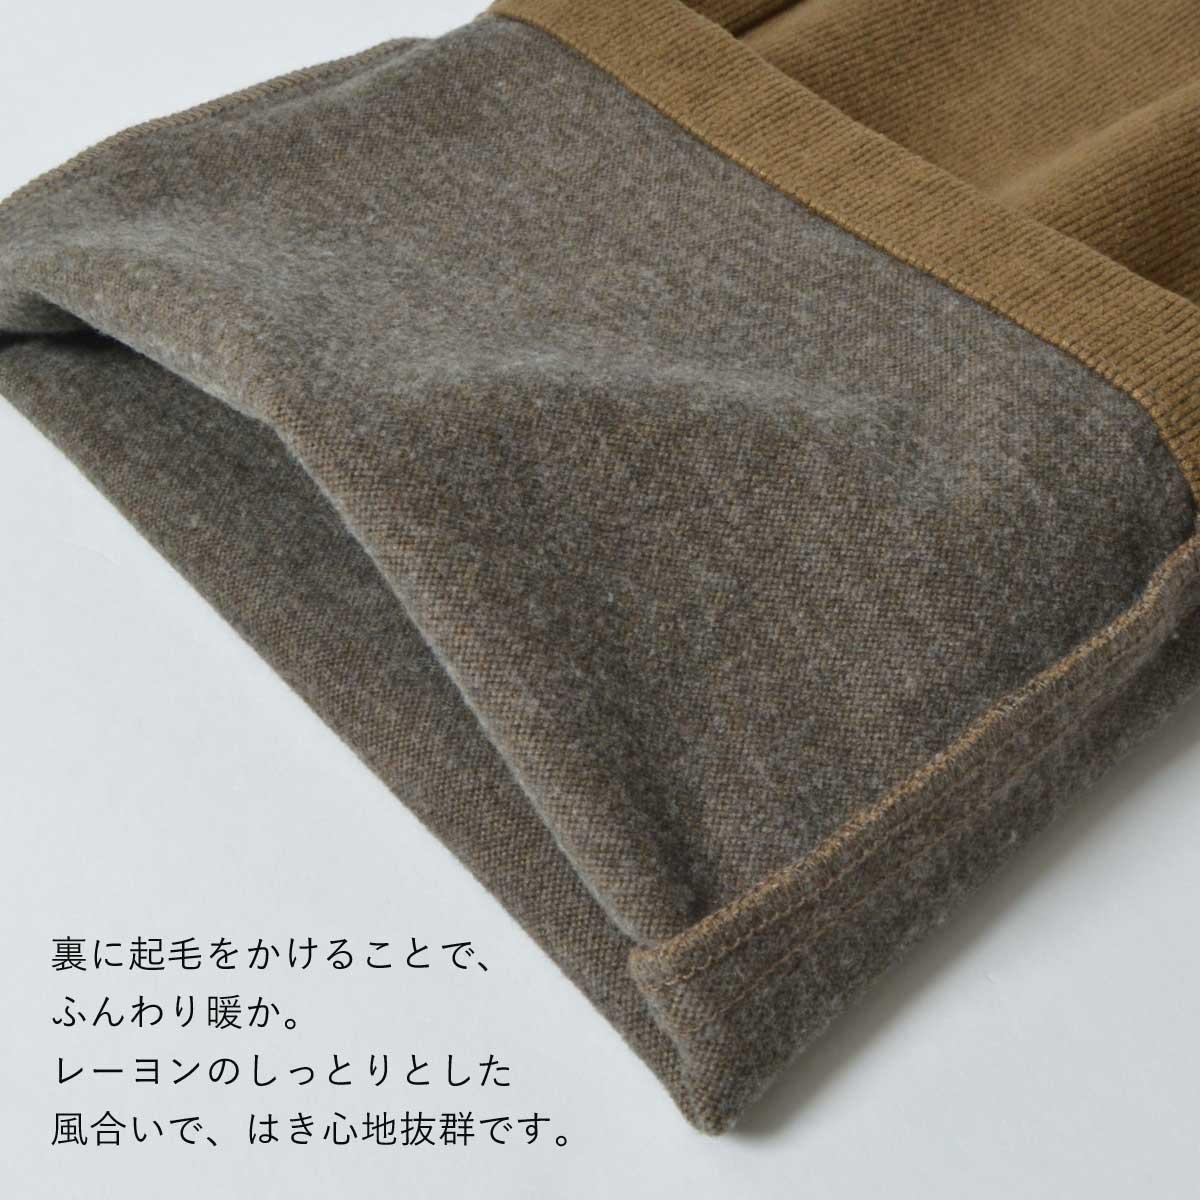 【NEW SALE】Mrs.Jeana ディナーストレート MJ4652